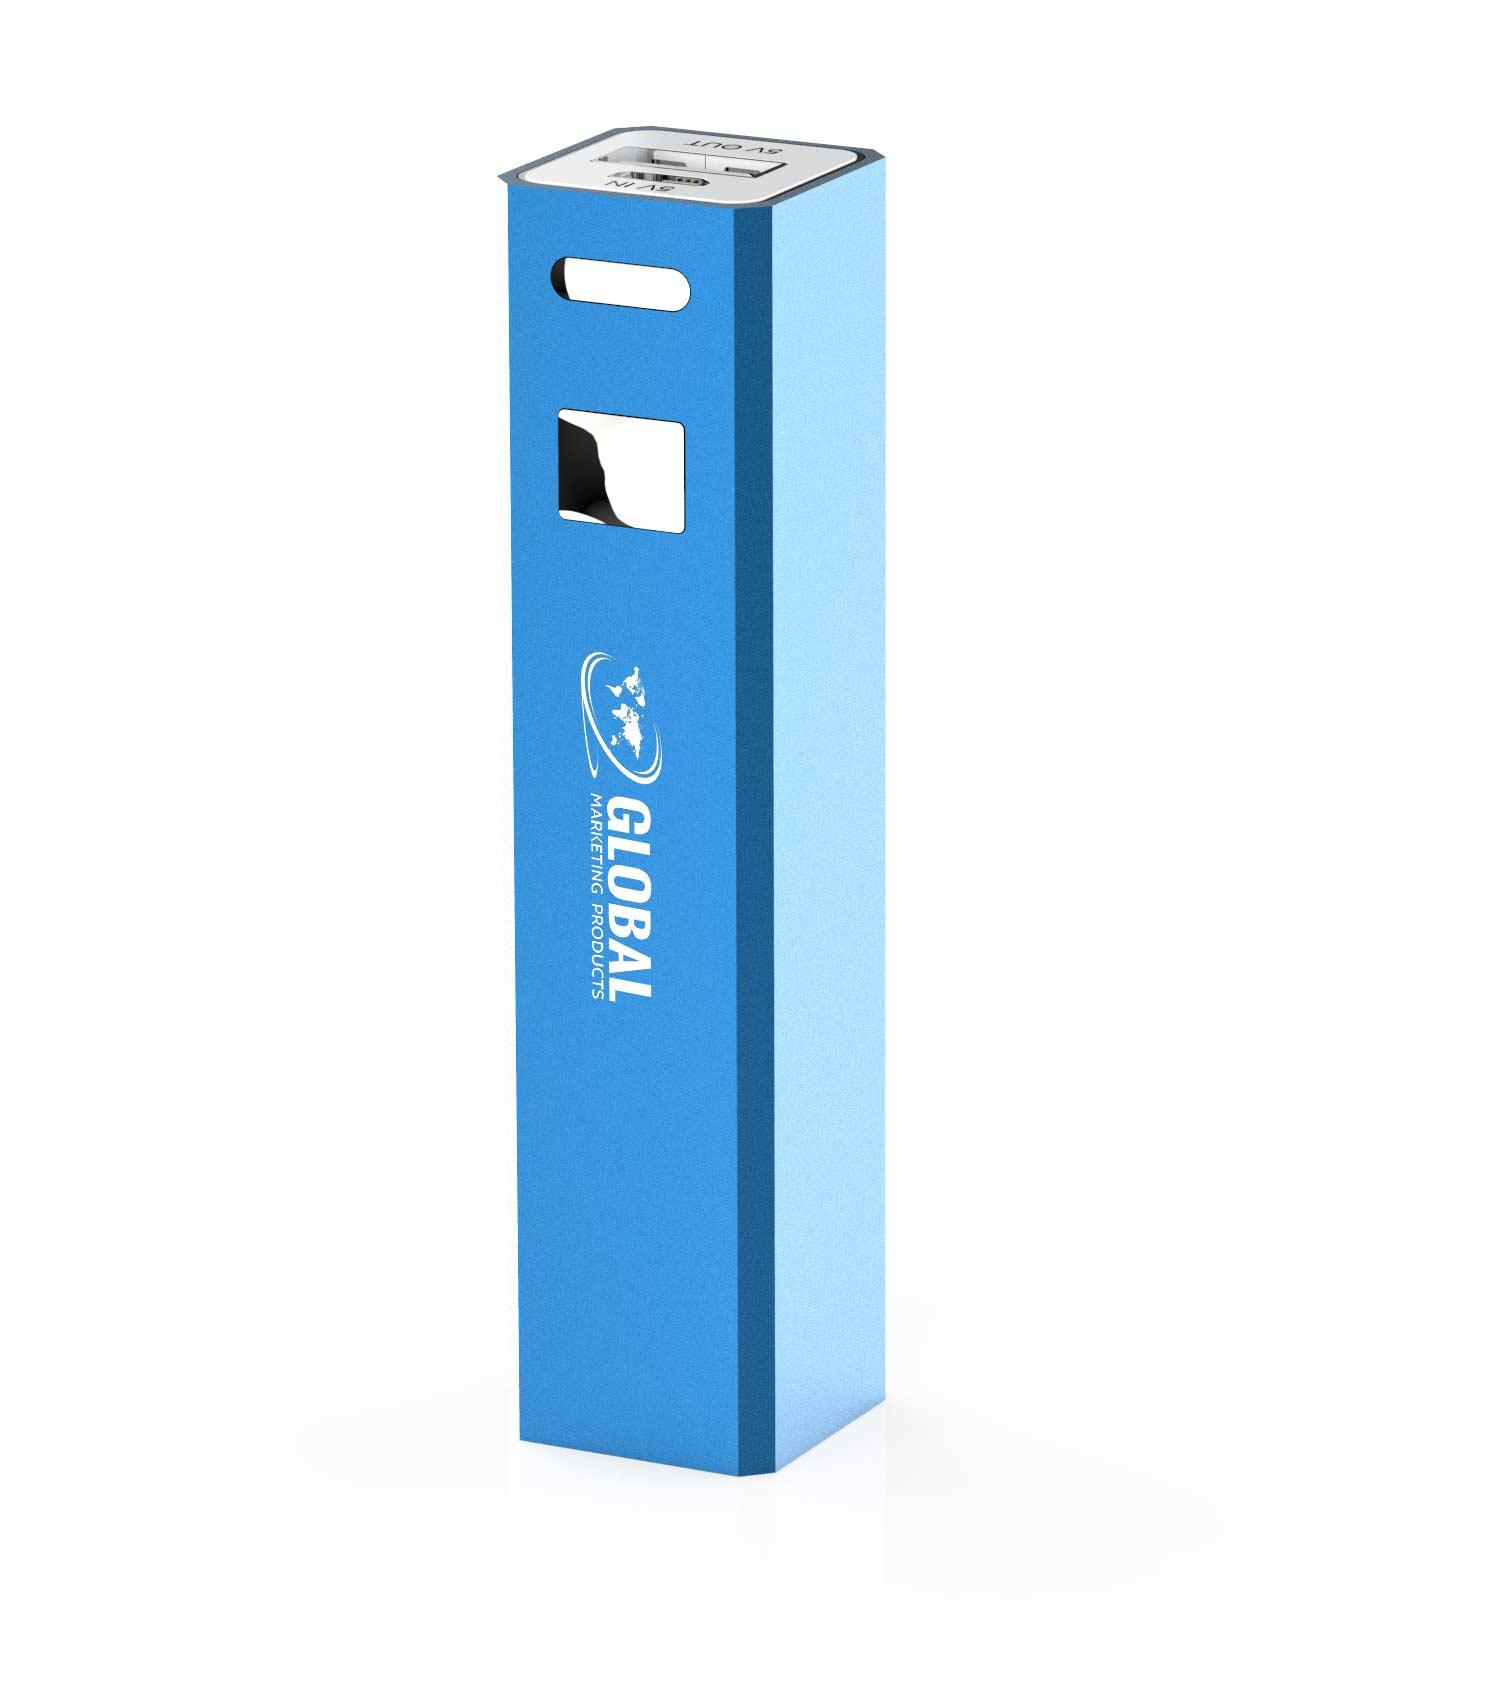 power_bank_1804_blue